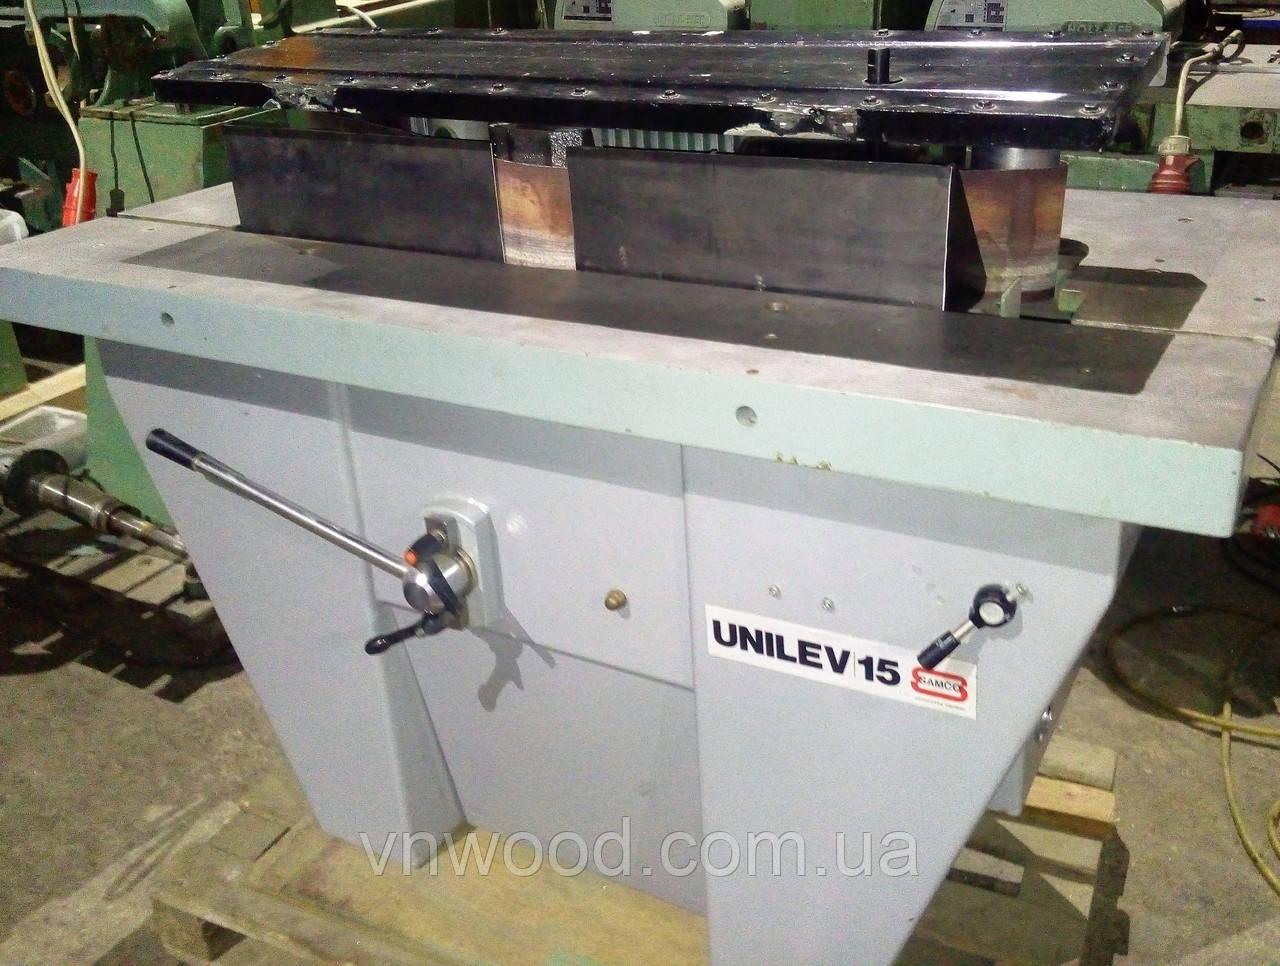 Крайкошліфувальний верстат Unilev 15 SAMCO  SCM